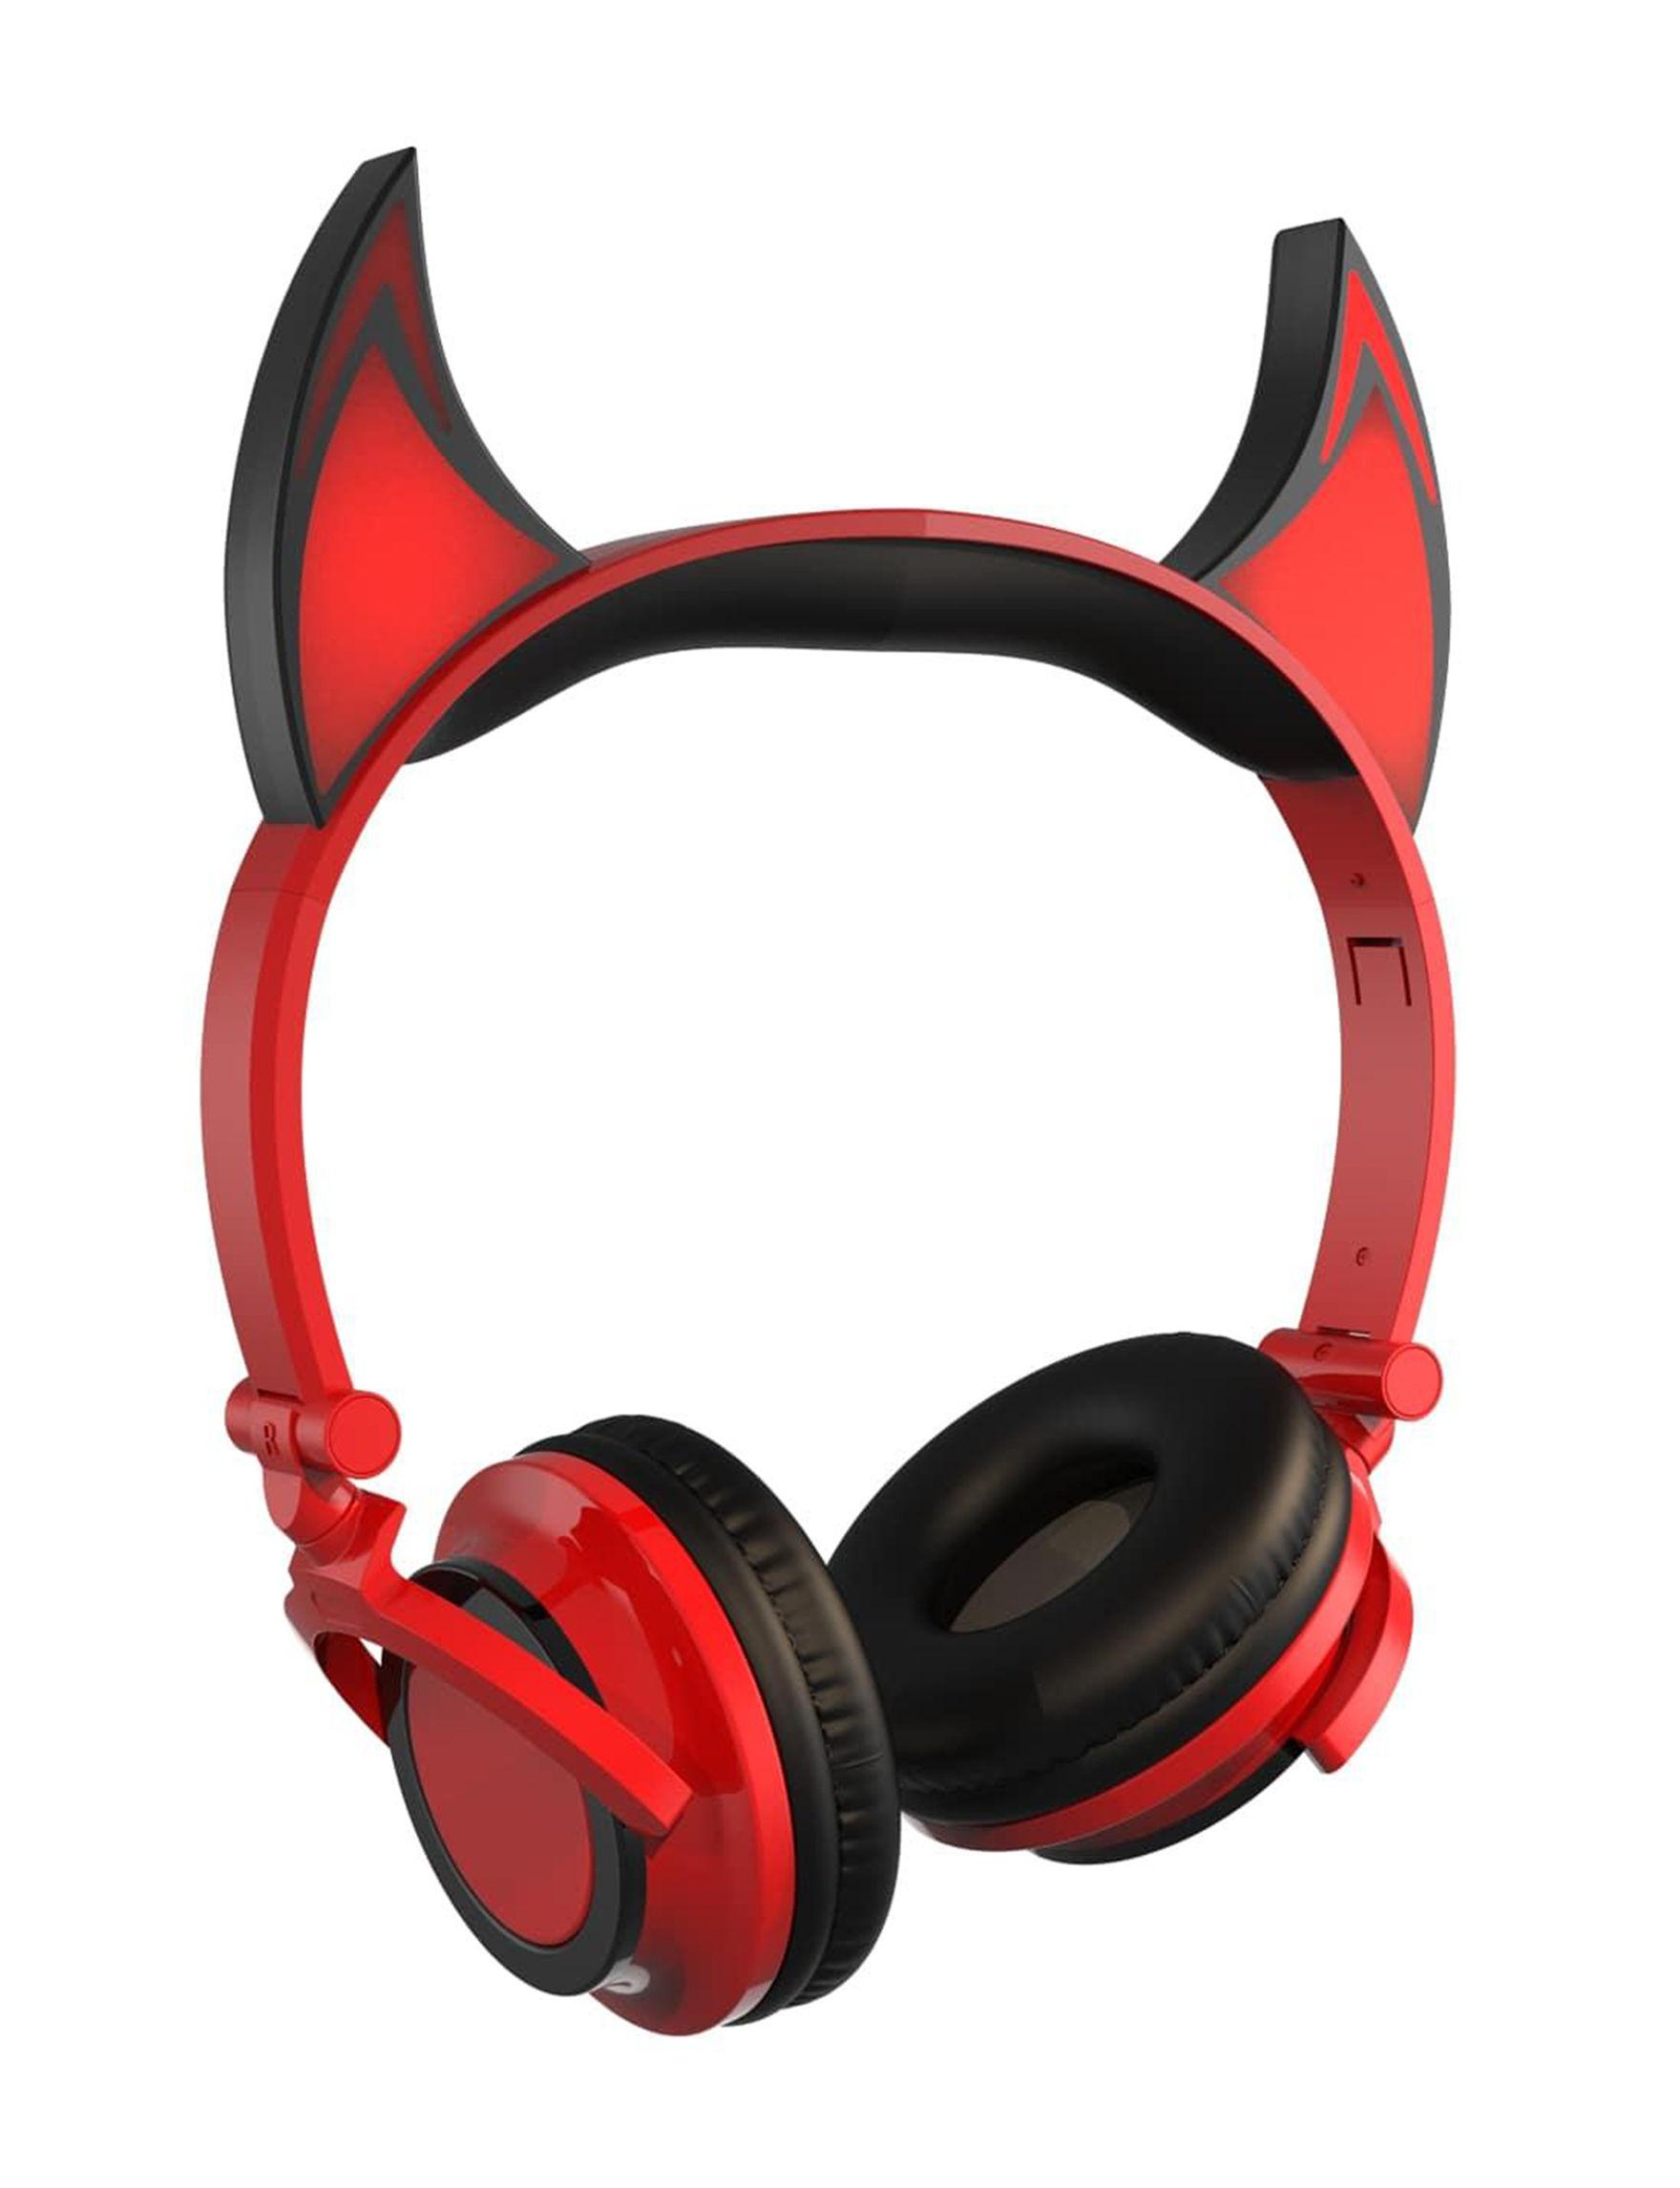 Art + Sound Red Headphones Tech Accessories